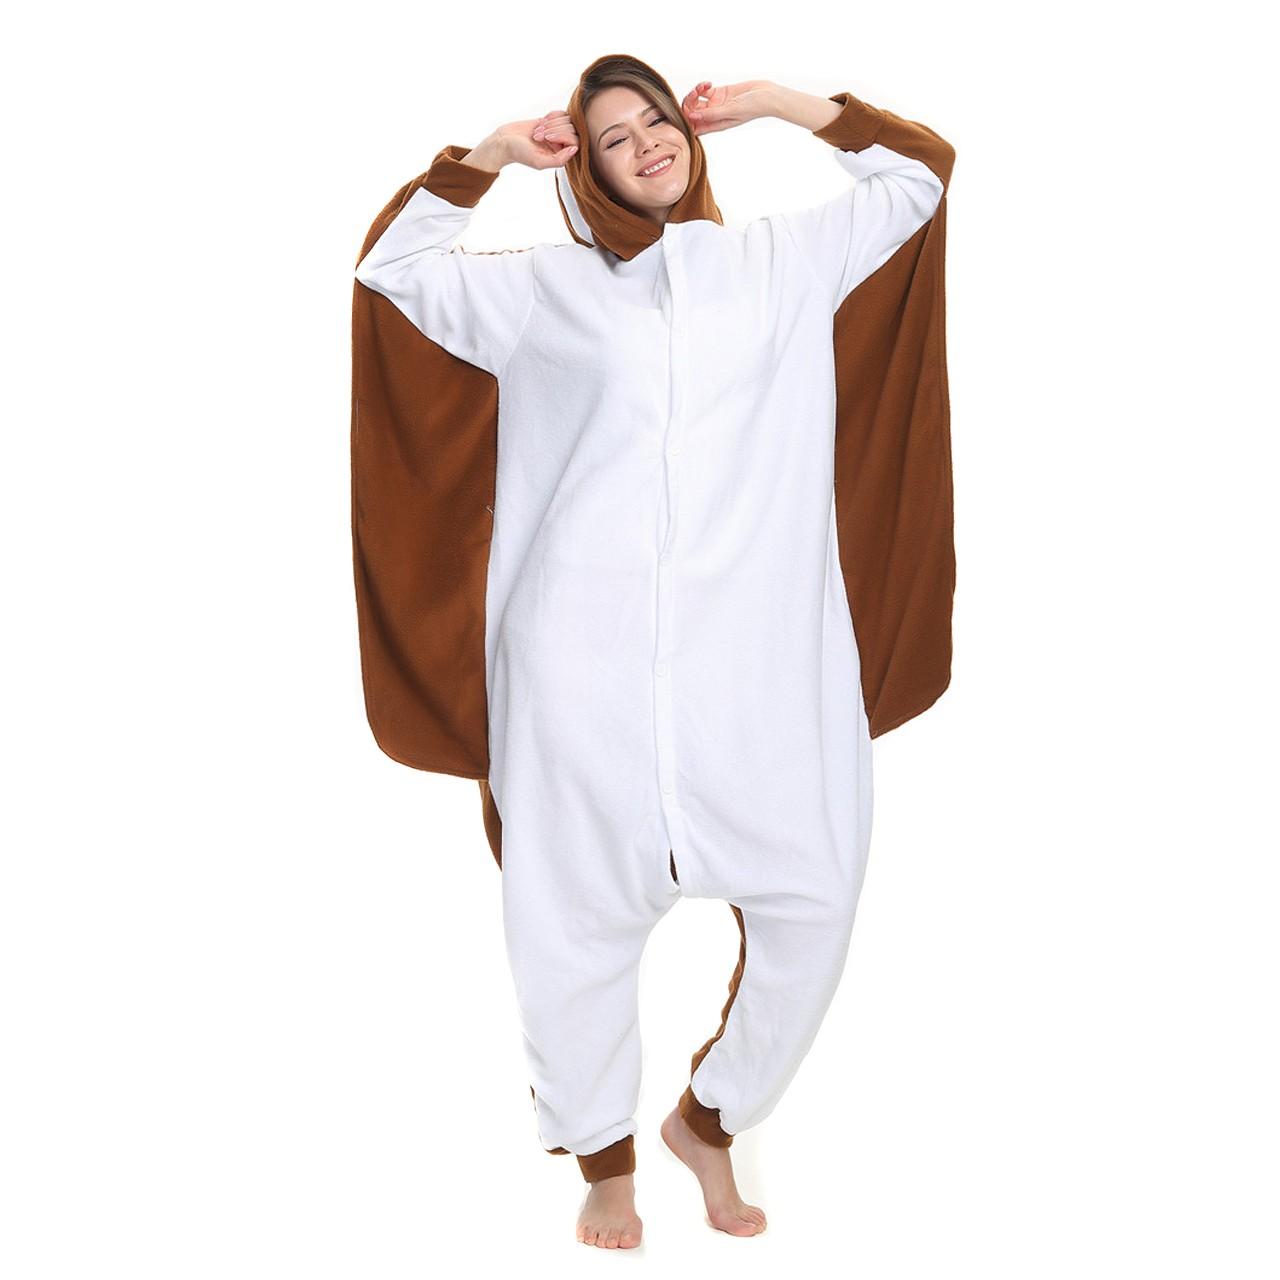 2a3a18320bc0 Flying Squirrel Onesie Animal Kigurumi Pajama Women   Men Halloween Costumes